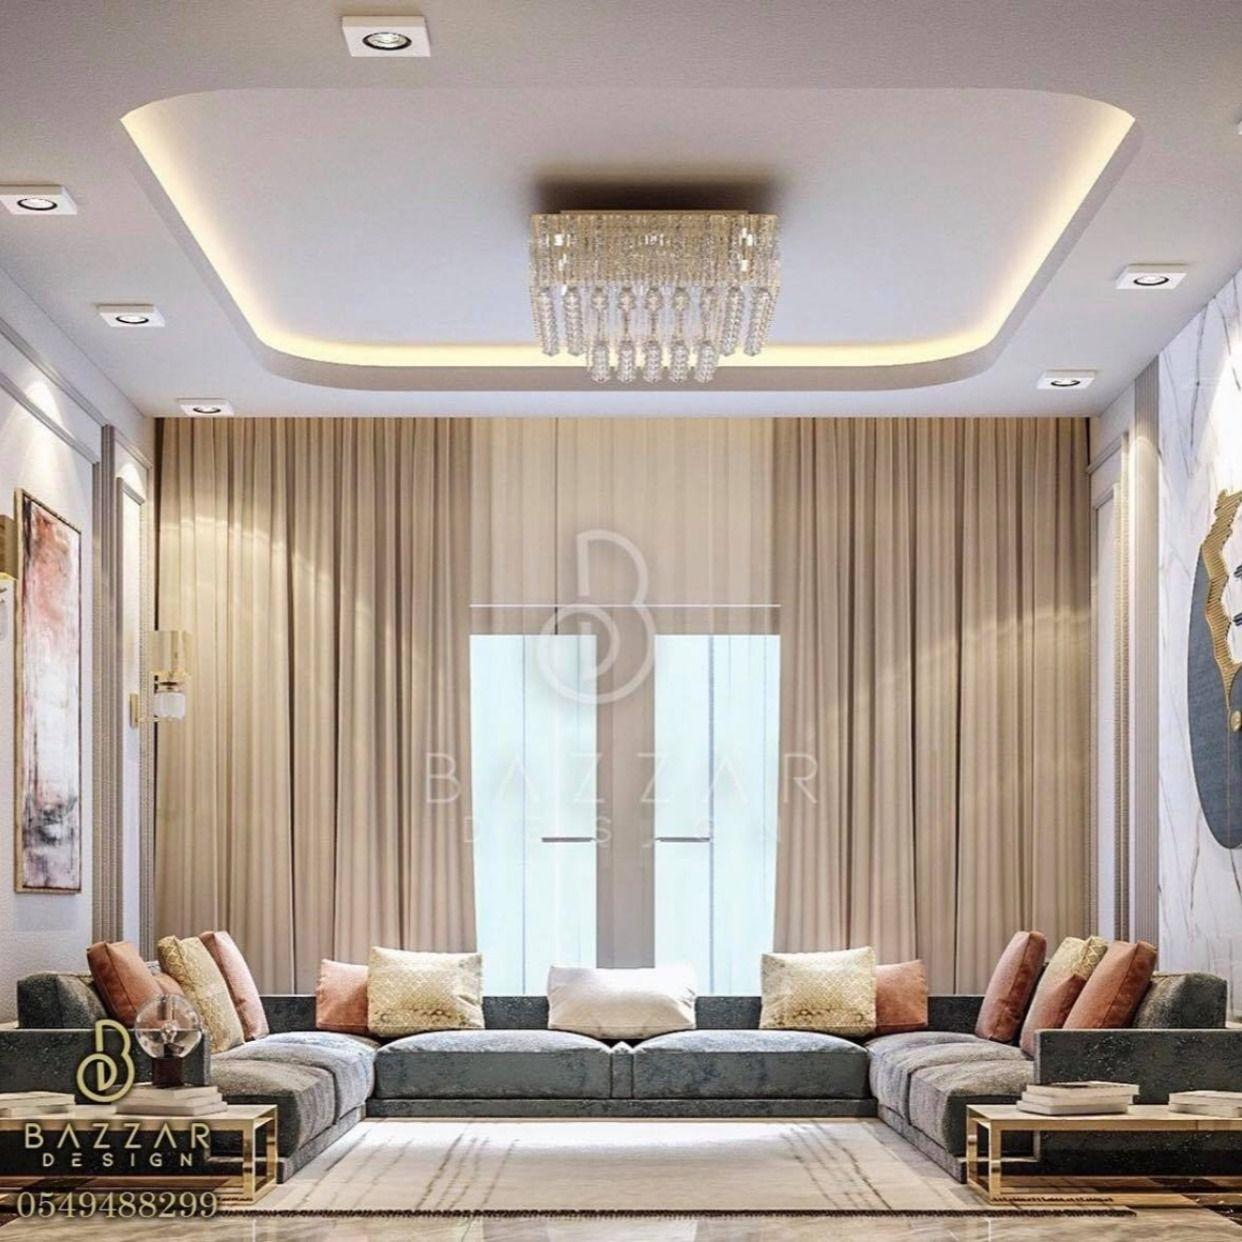 10 Ideas For Living Room Design Living Room Decor Gray Modern Interior Decor Room Design